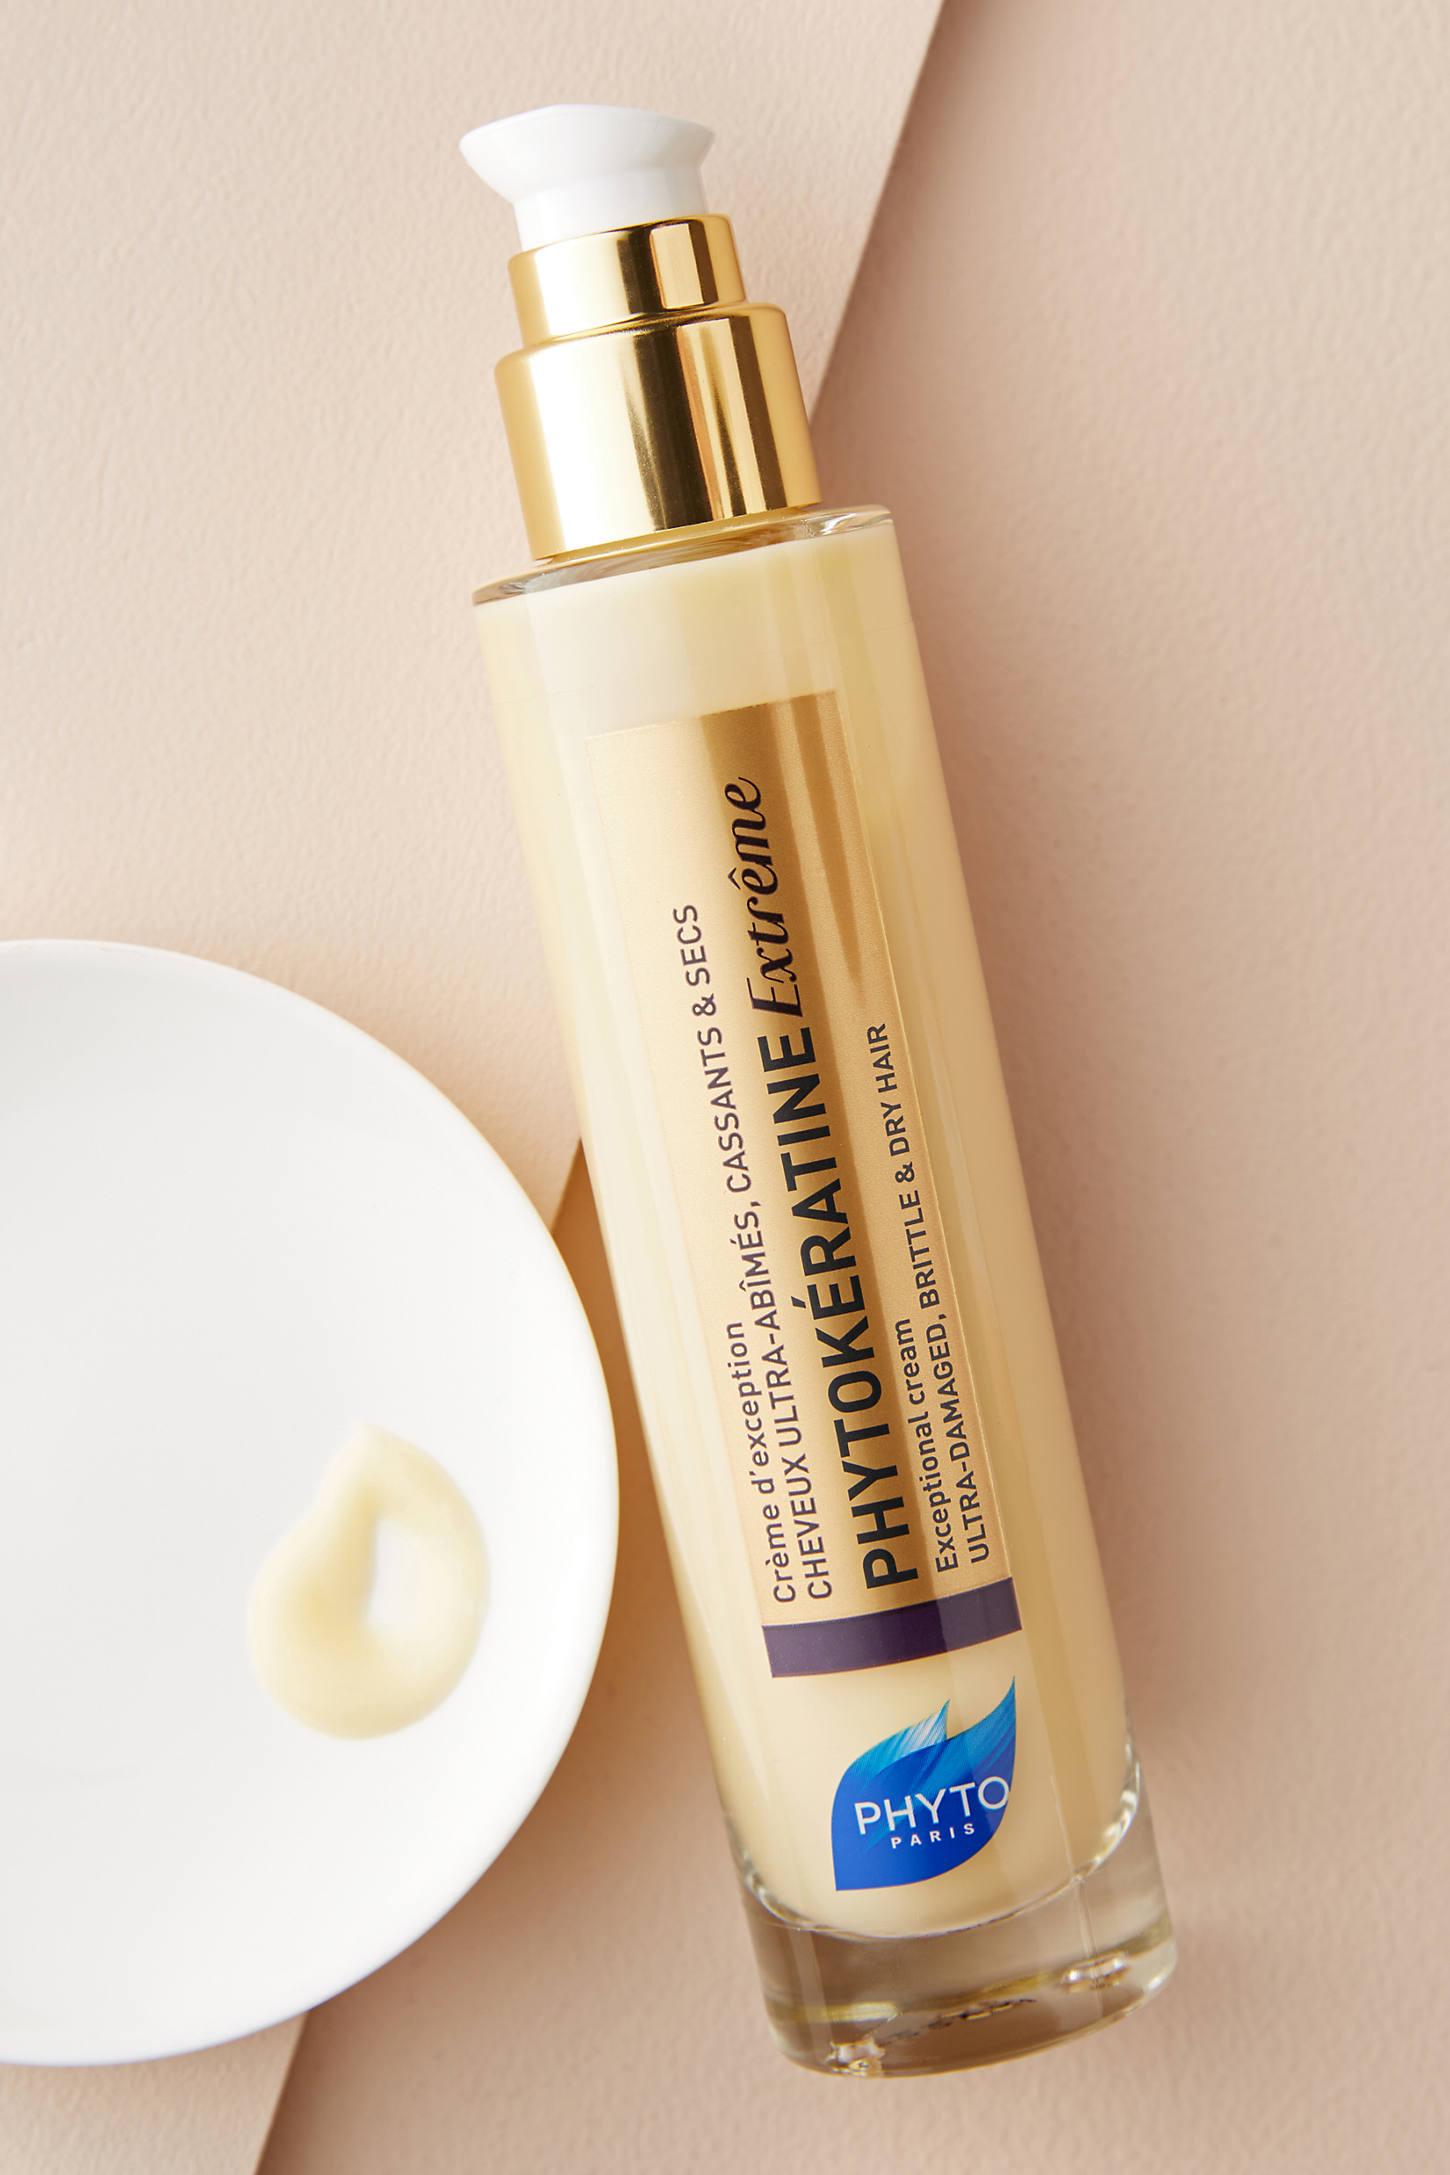 Phyto Phytokeratin Extreme Exceptional Cream